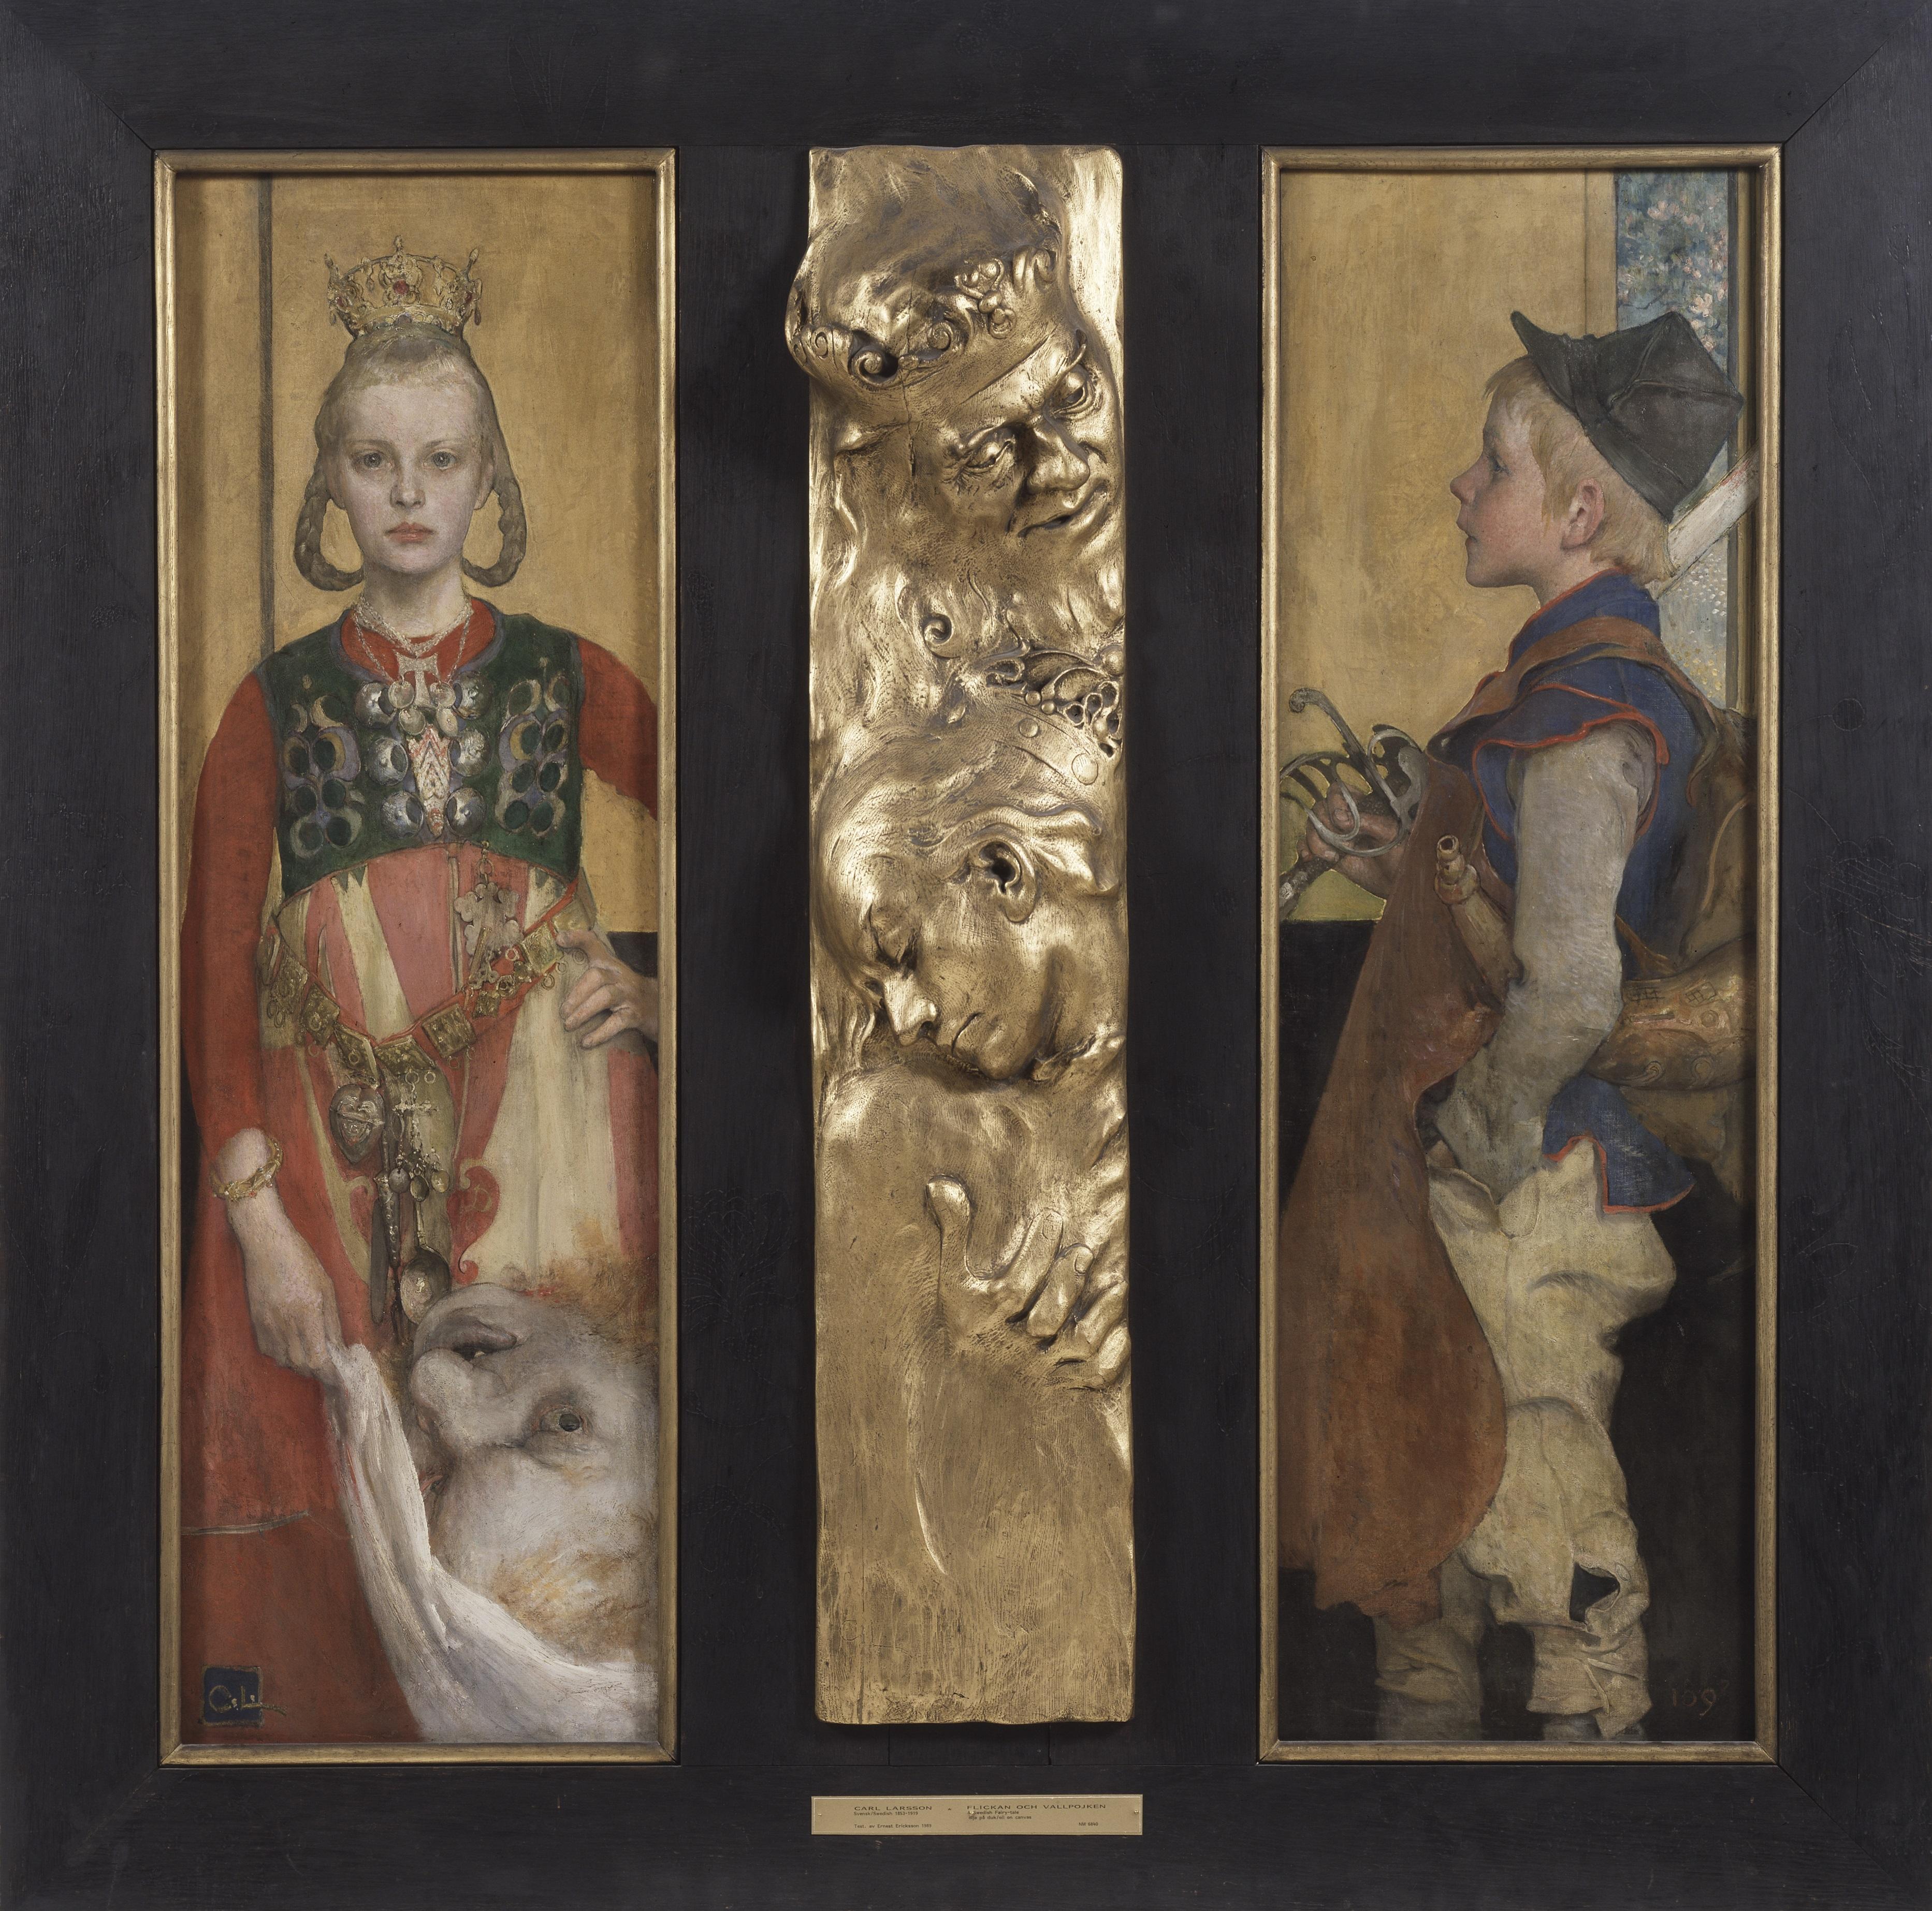 A_Swedish_Fairy_Tale_La princesse et le berger Prinsessan och Vallpojken(Carl_Larsson 1897)_-_Nationalmuseum_-_23889